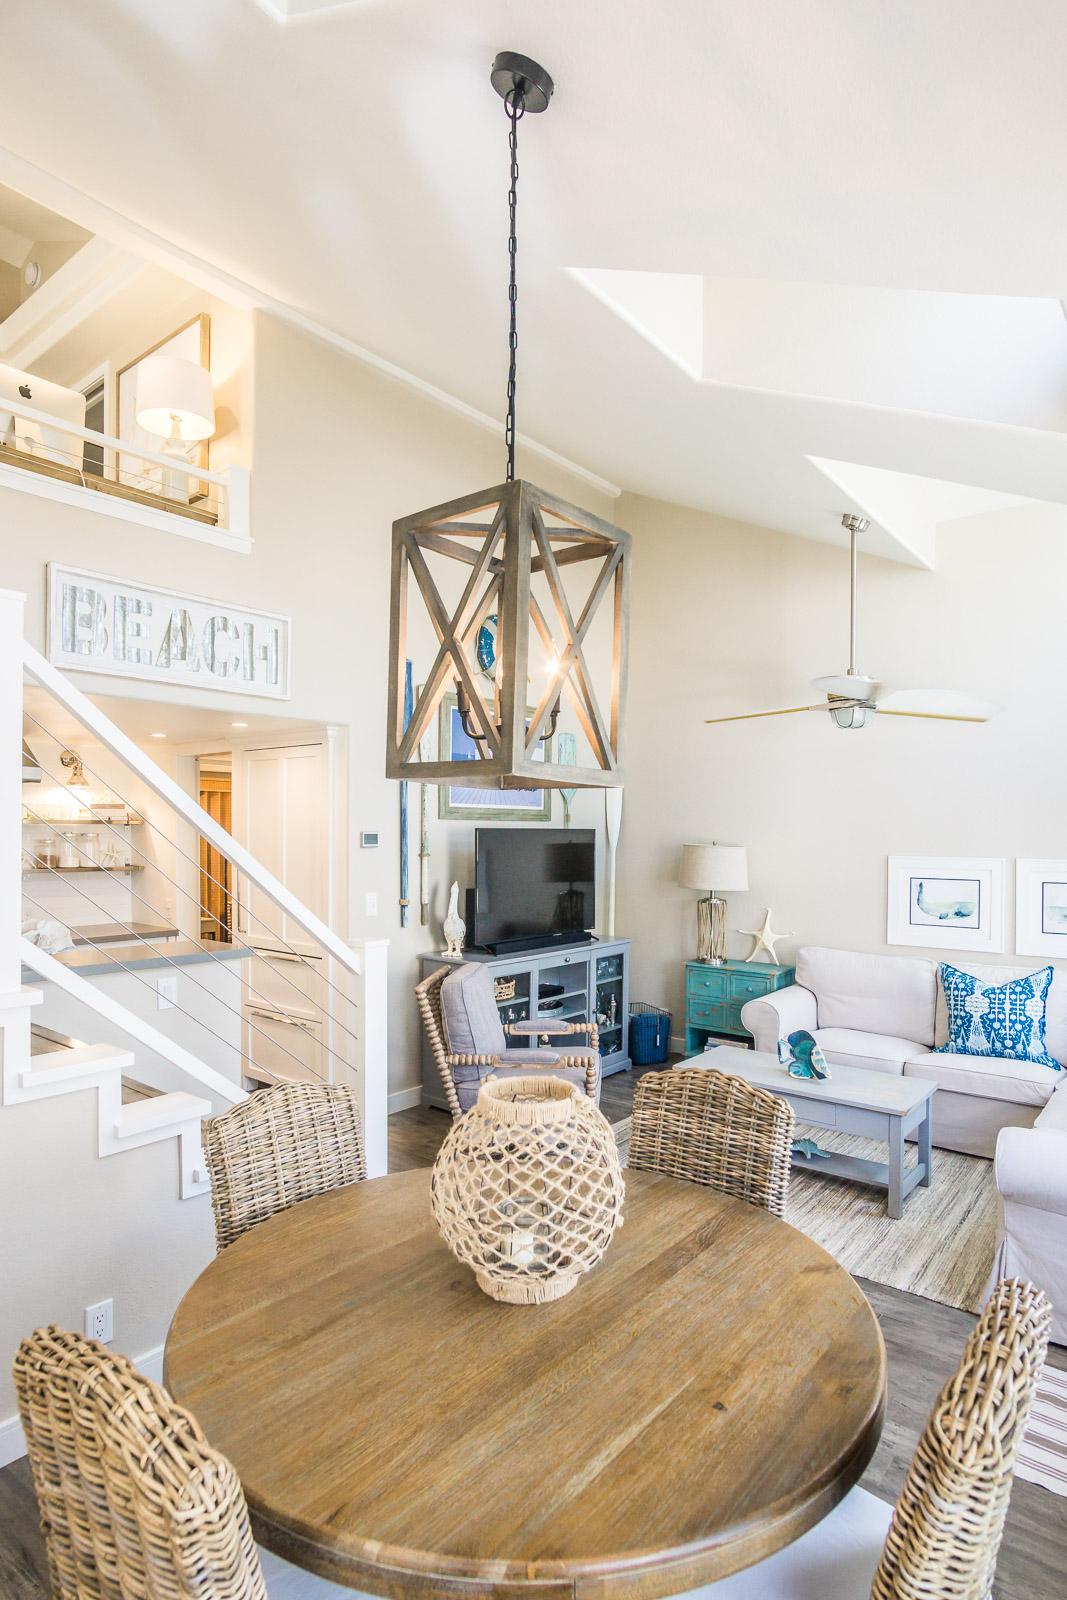 Cozy beach cottage on Lido Island Newport Beach designed by Raili Clasen of Raili CA design